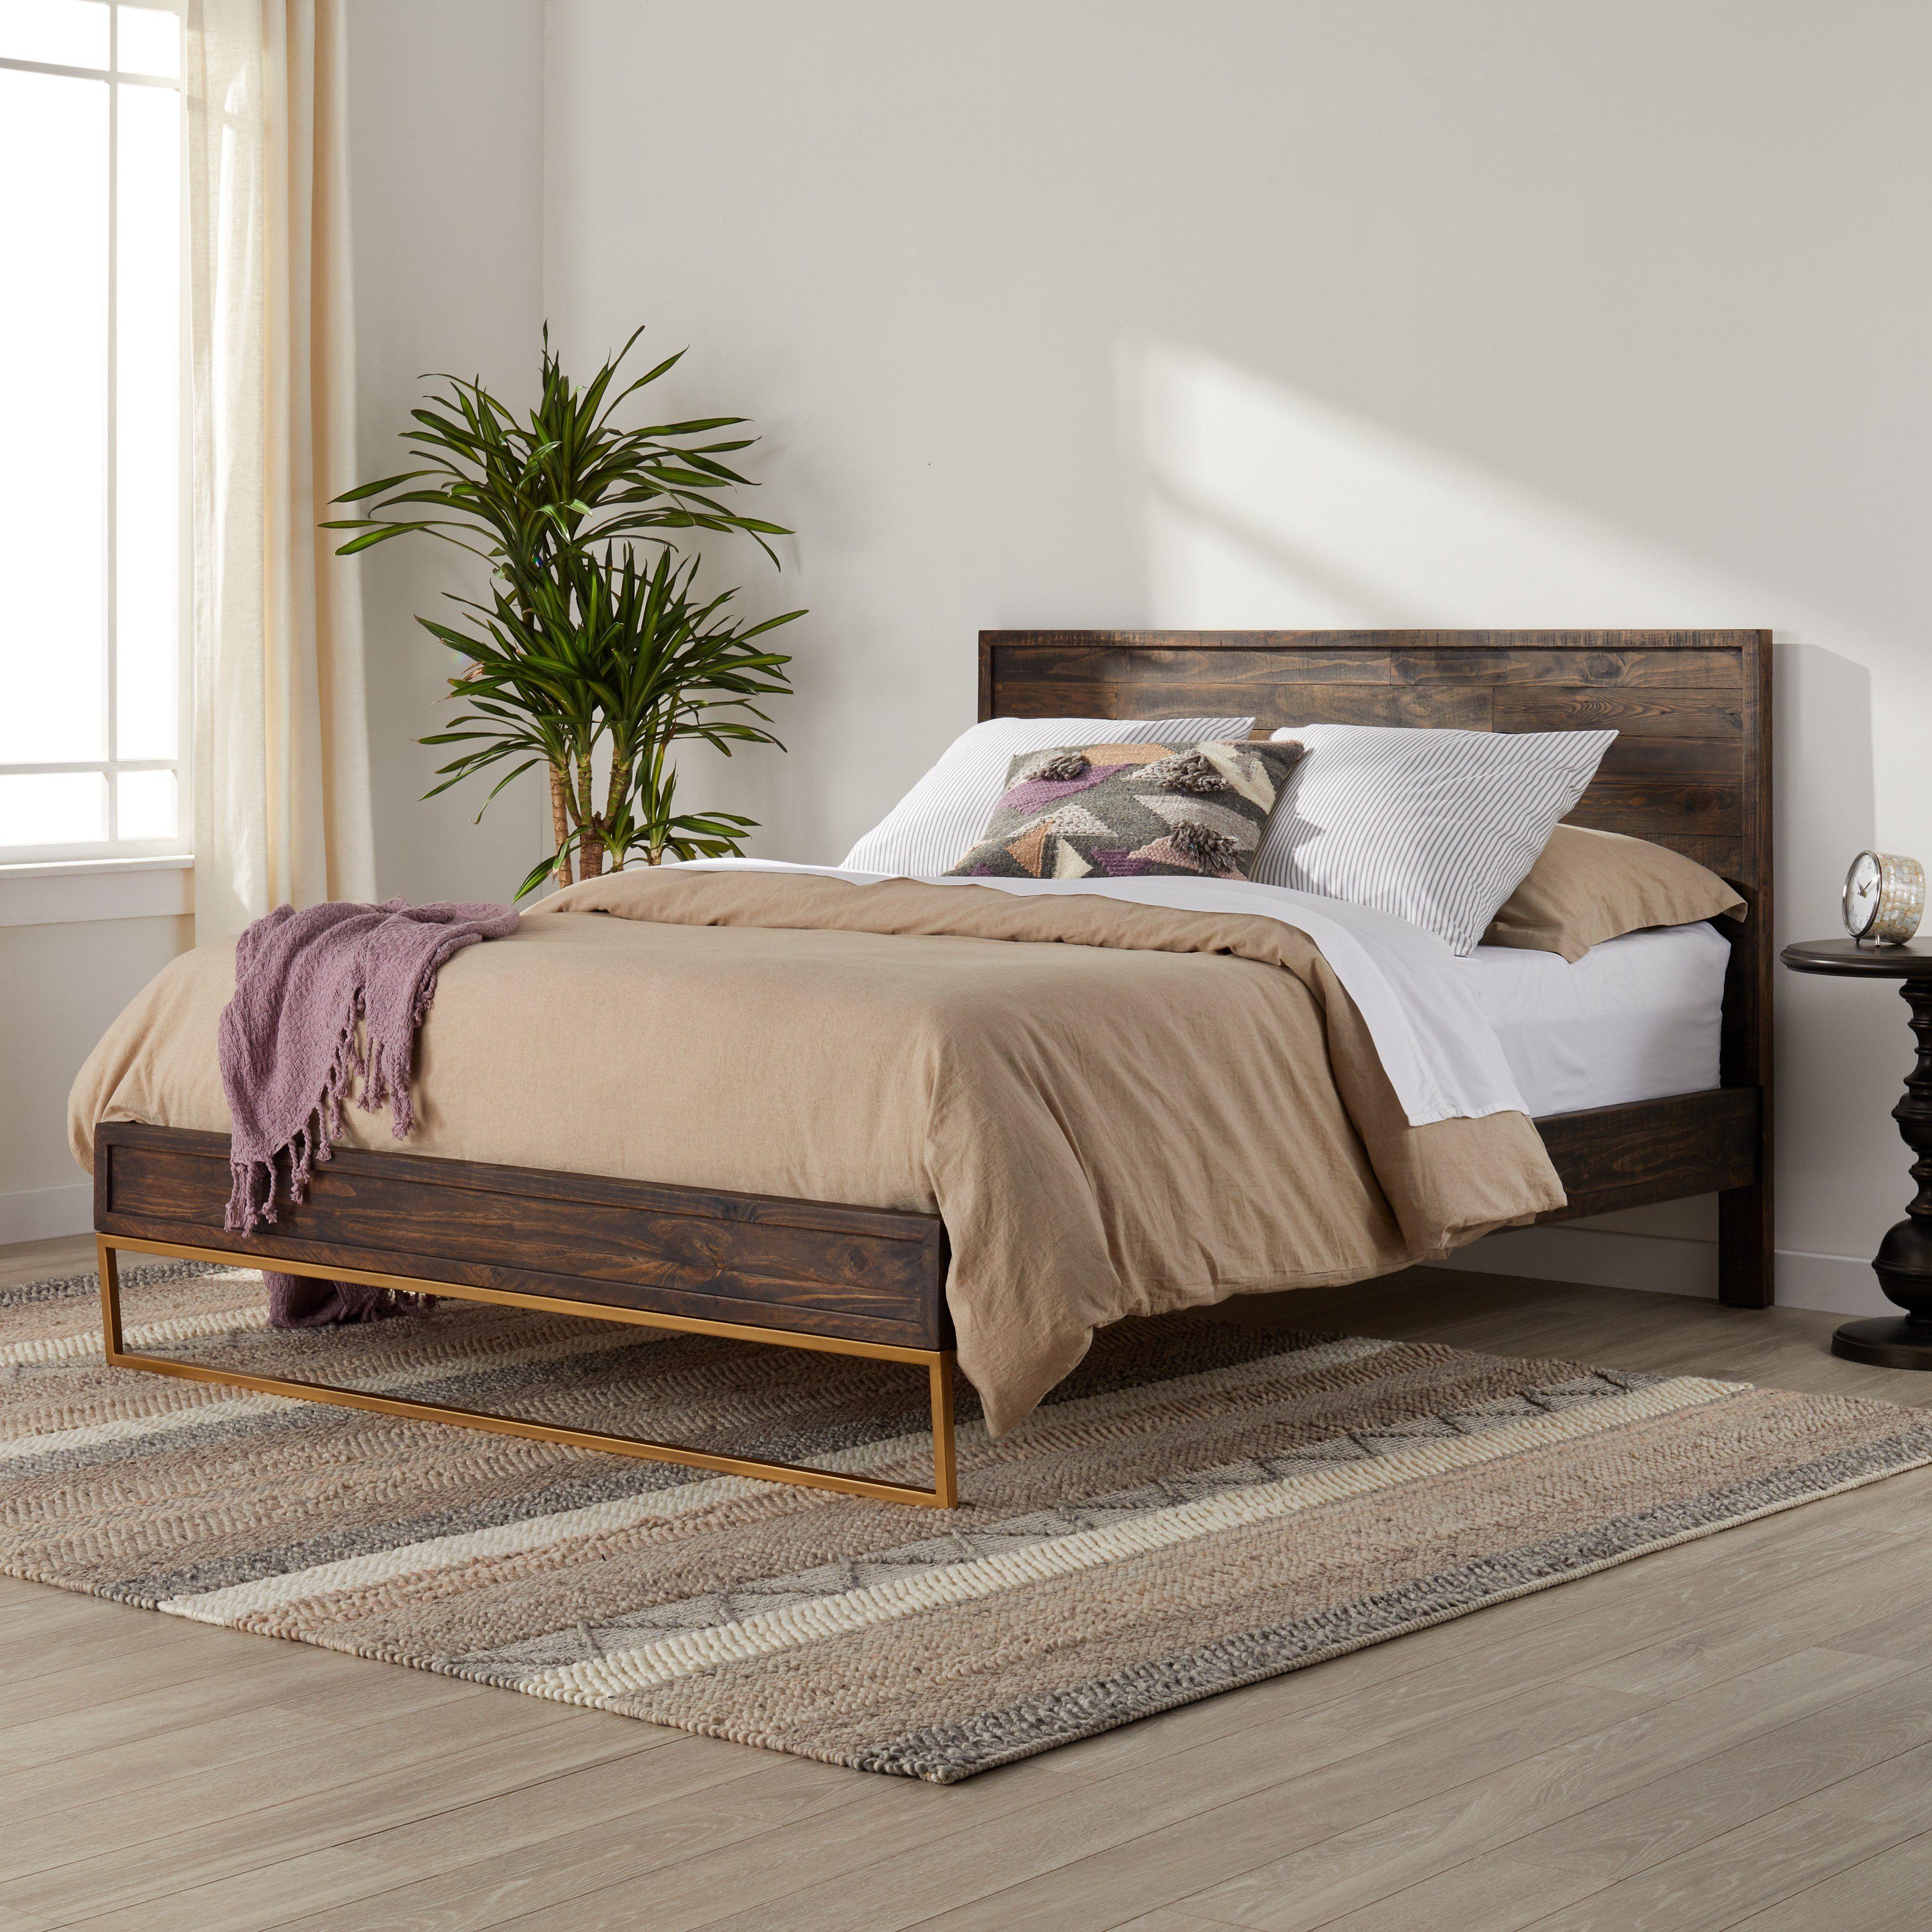 Strick Bolton Monterey Reclaimed Pine Steel Queen Bed Frame